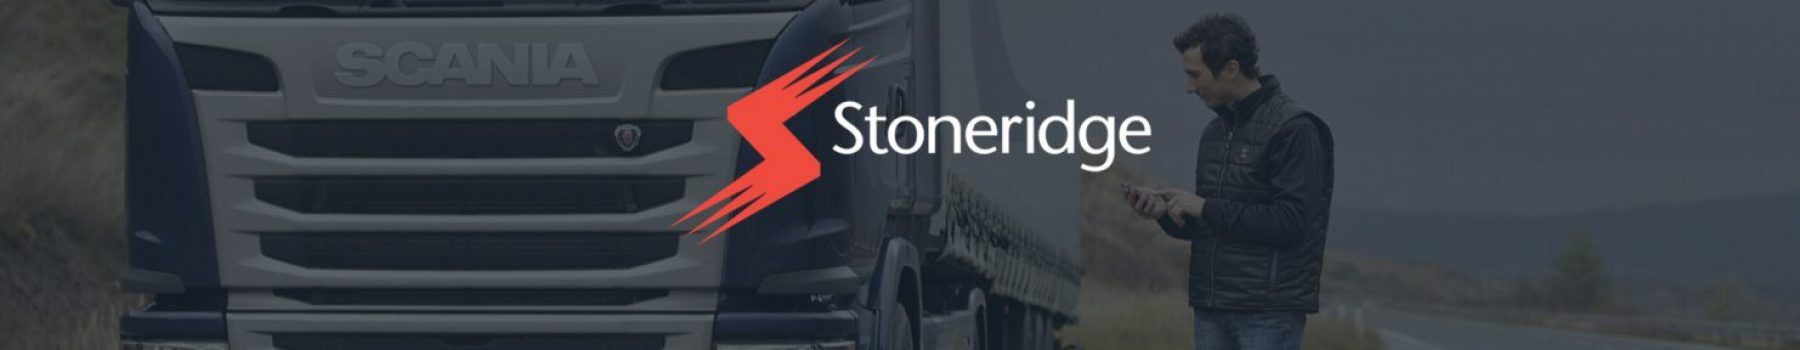 stoneridge-tachographs